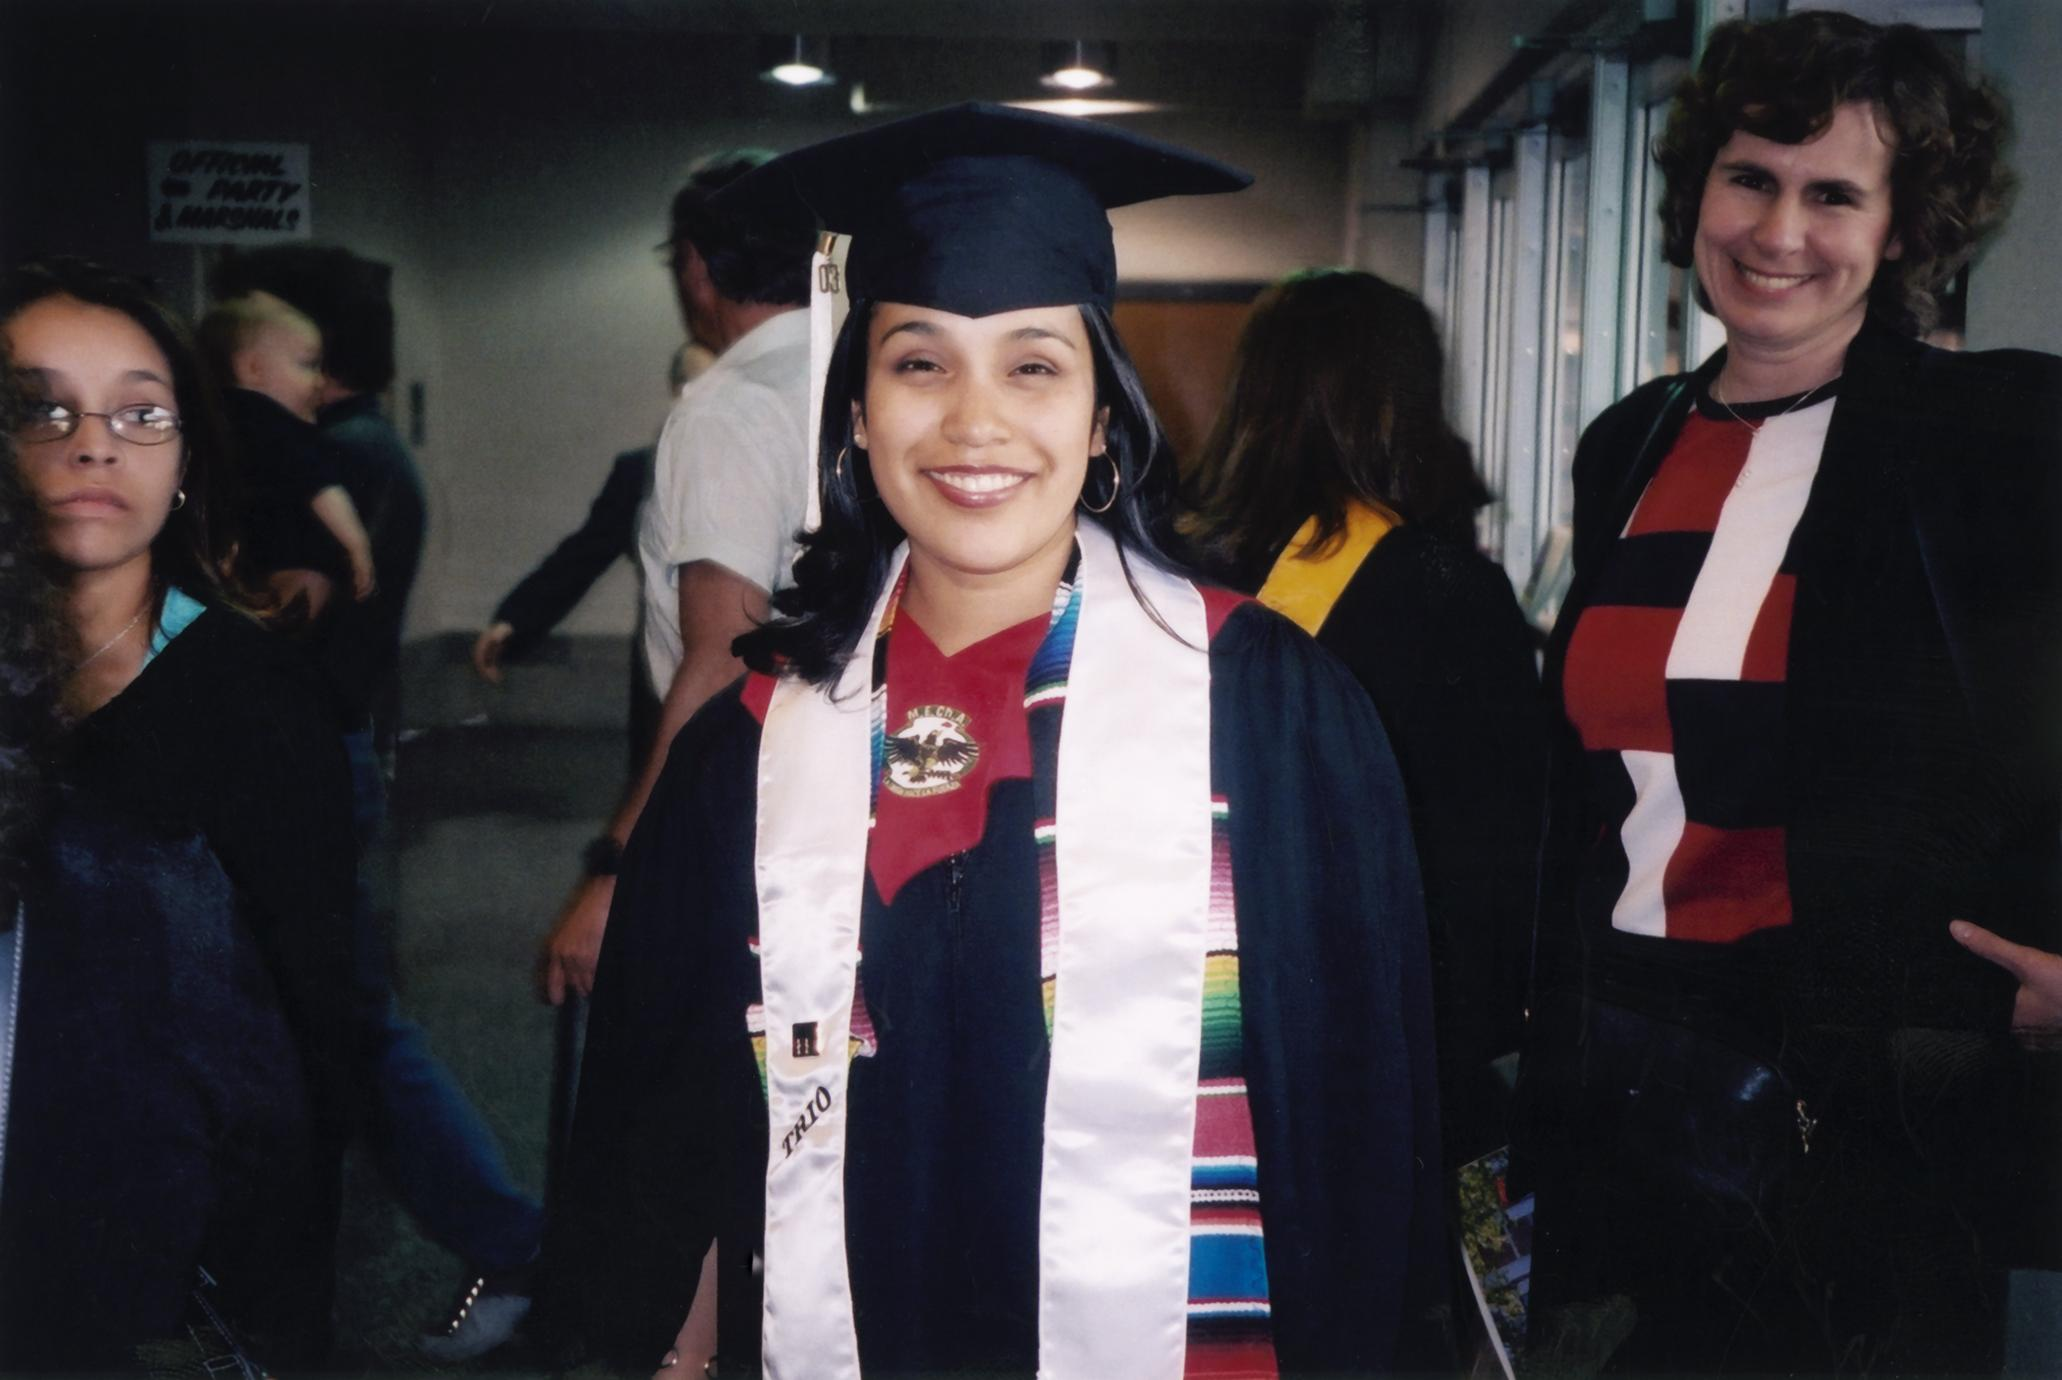 Gladys Reyes at 2003 graduation